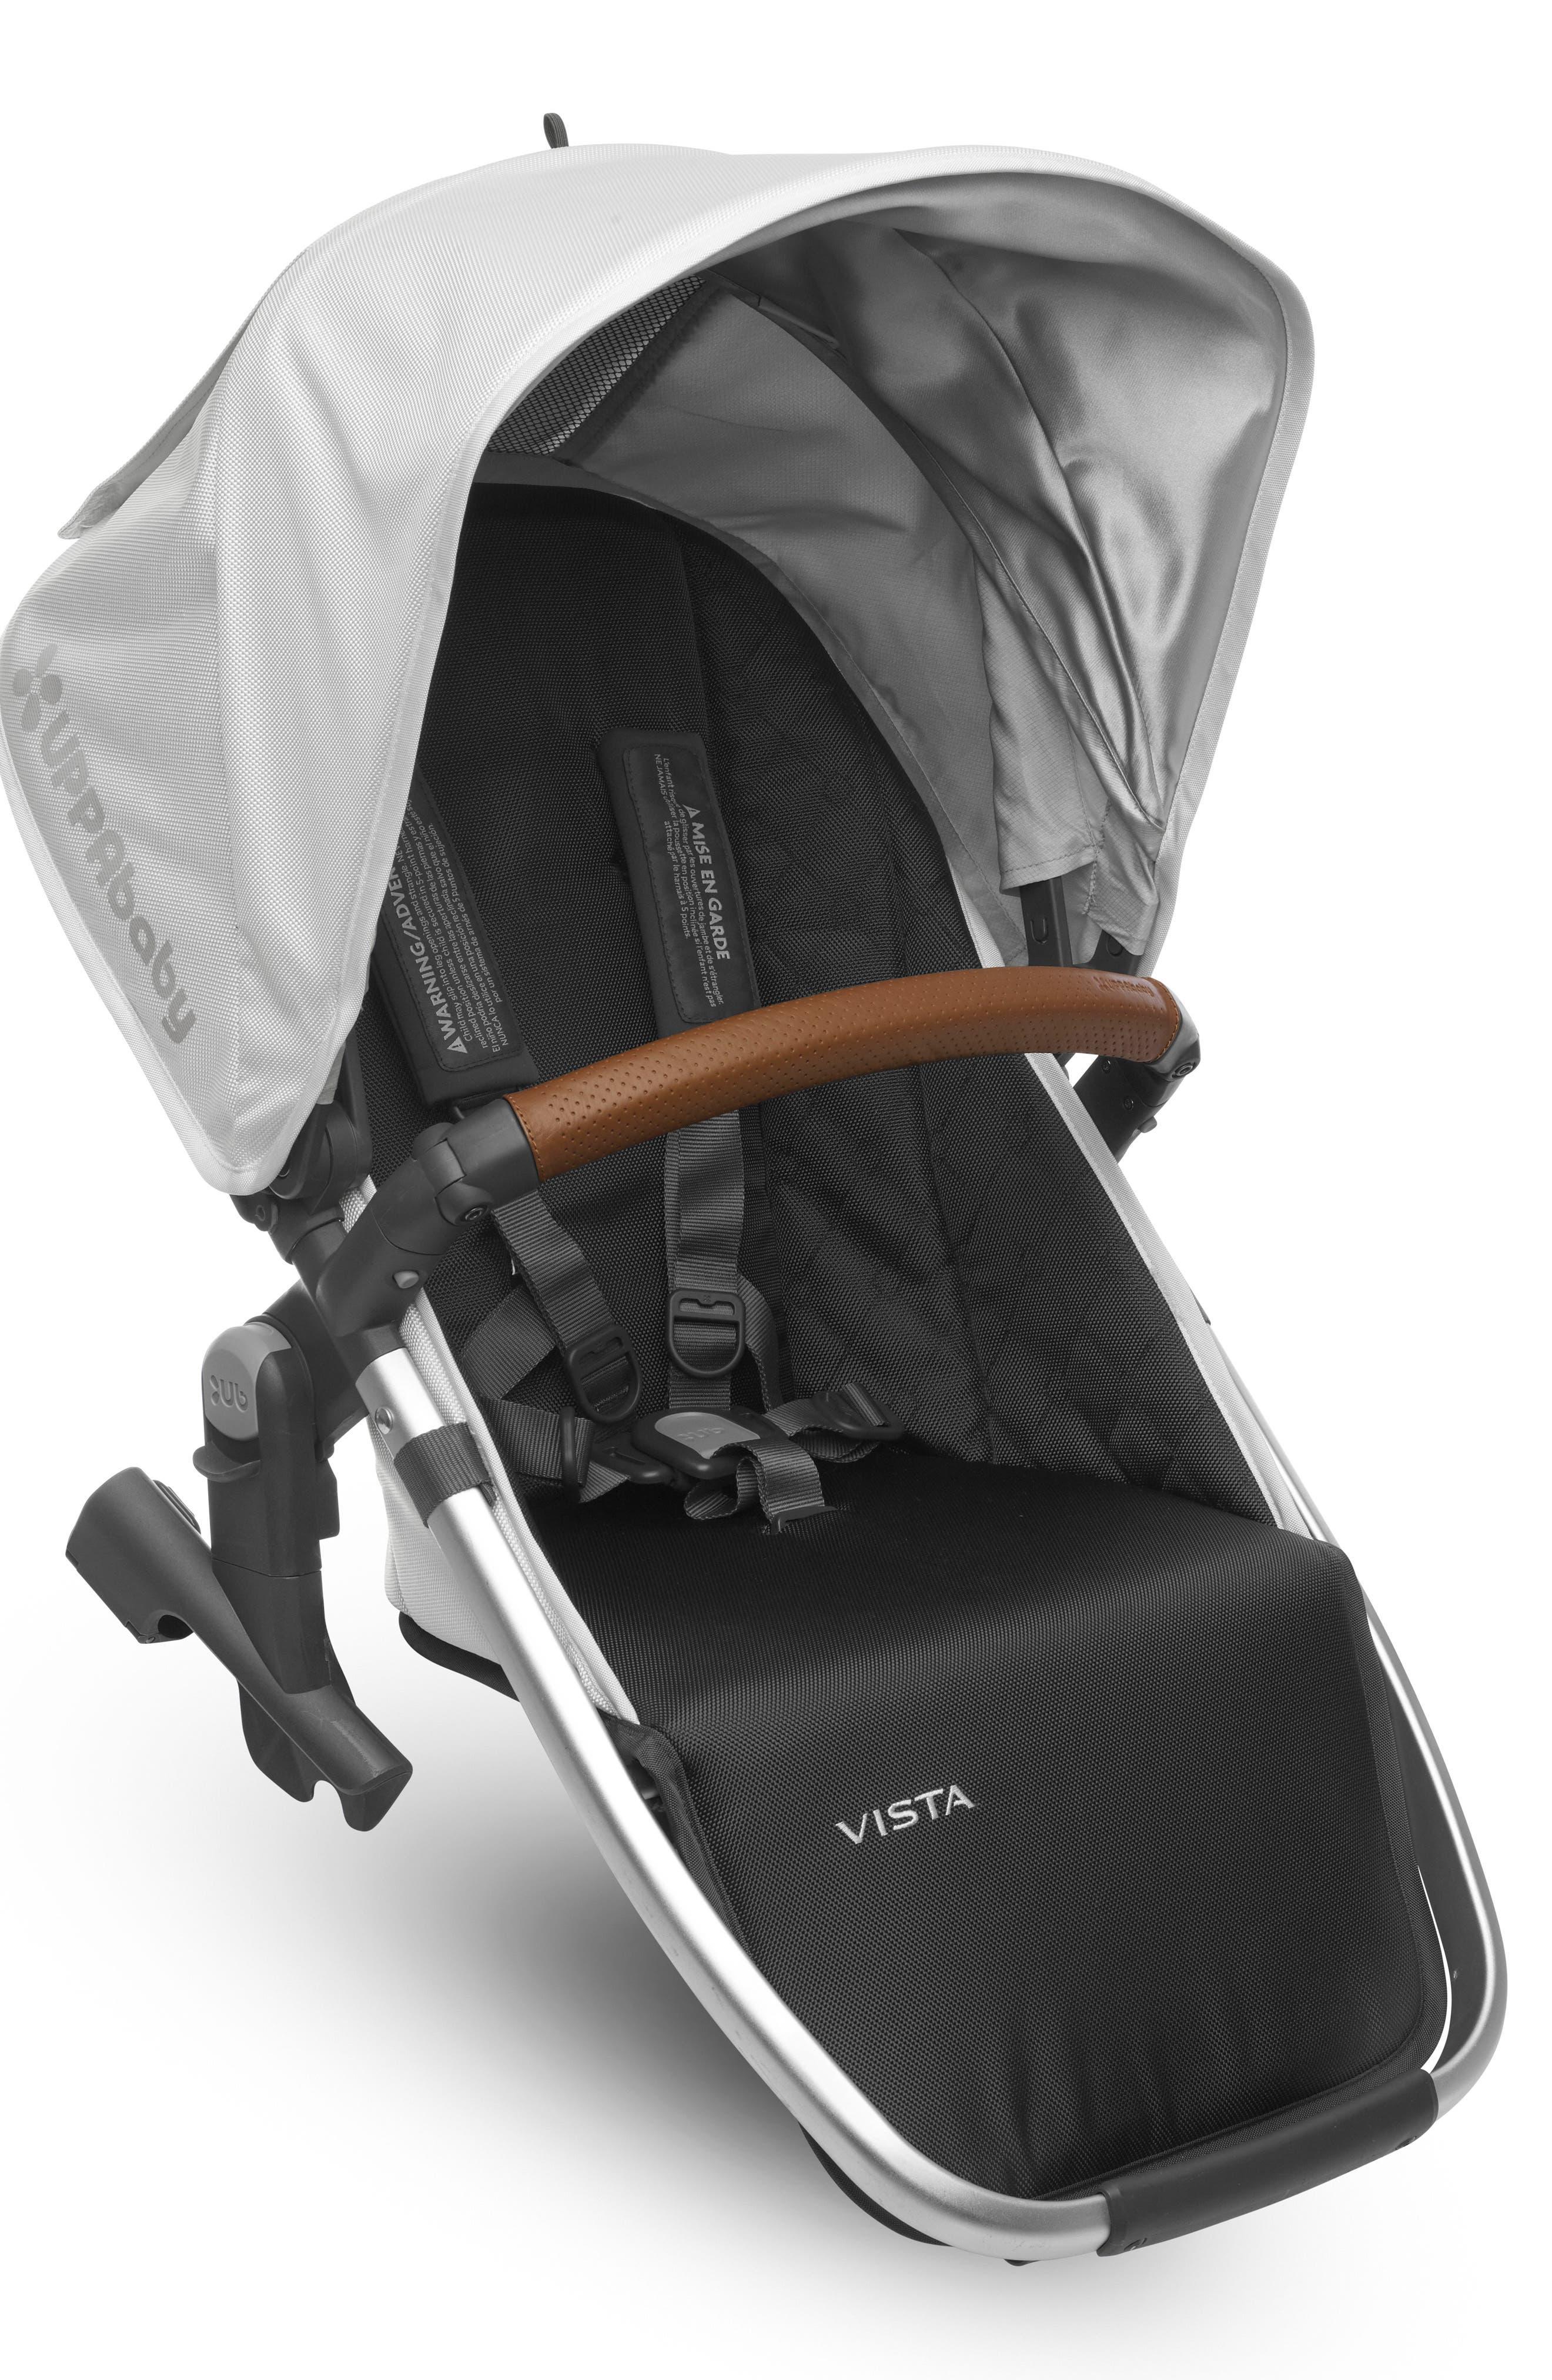 VISTA Stroller Rumble Seat,                             Main thumbnail 1, color,                             White/ Silver